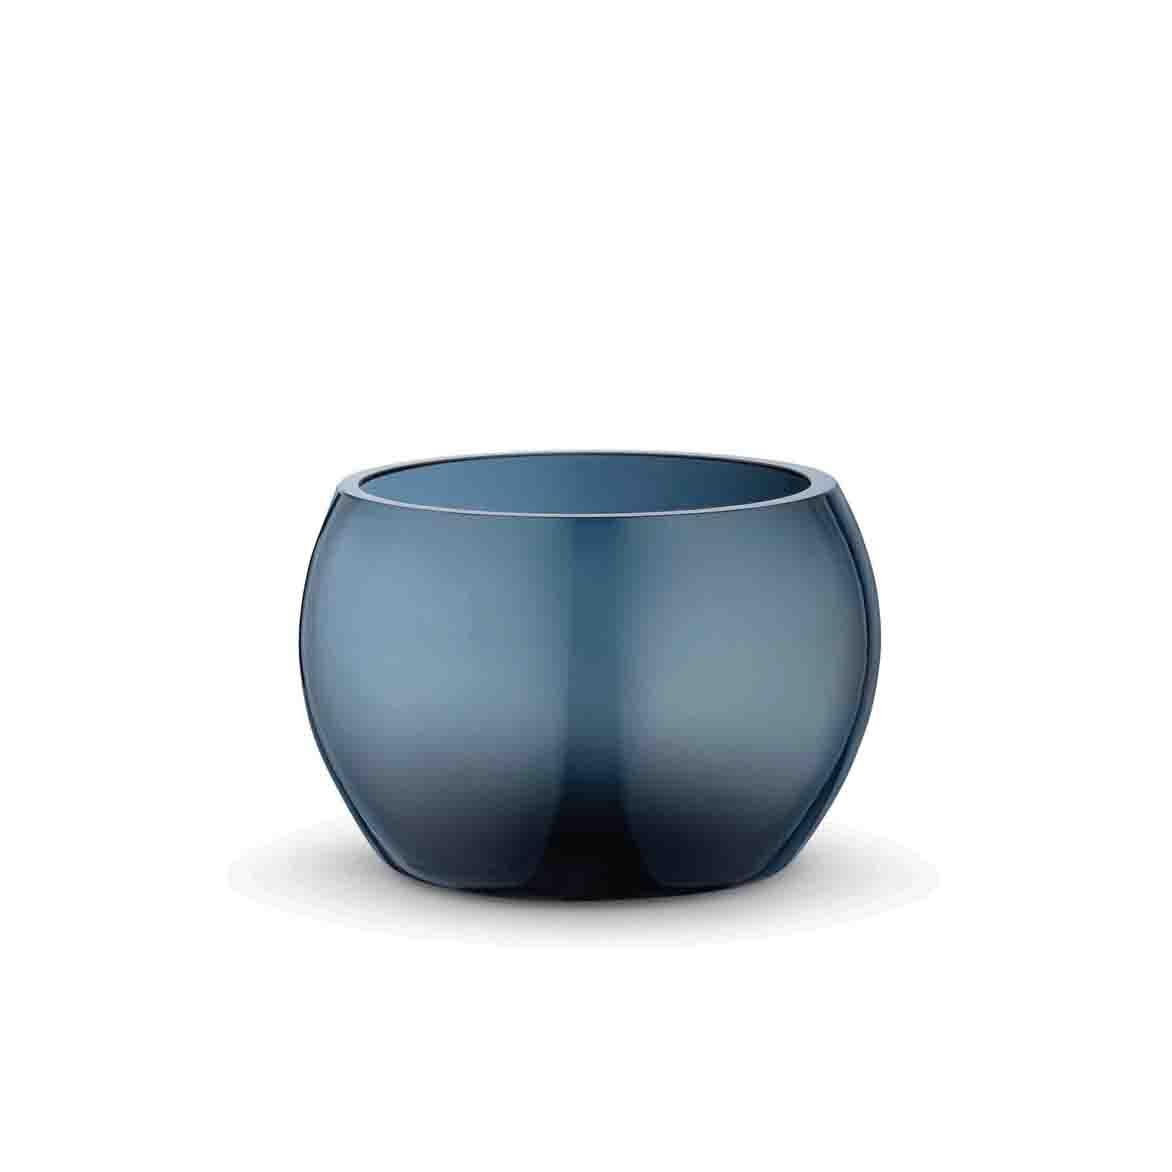 LIVING GEORG JENSEN CAFU系列 - 手工玻璃置物皿 建議售價NT$3,500